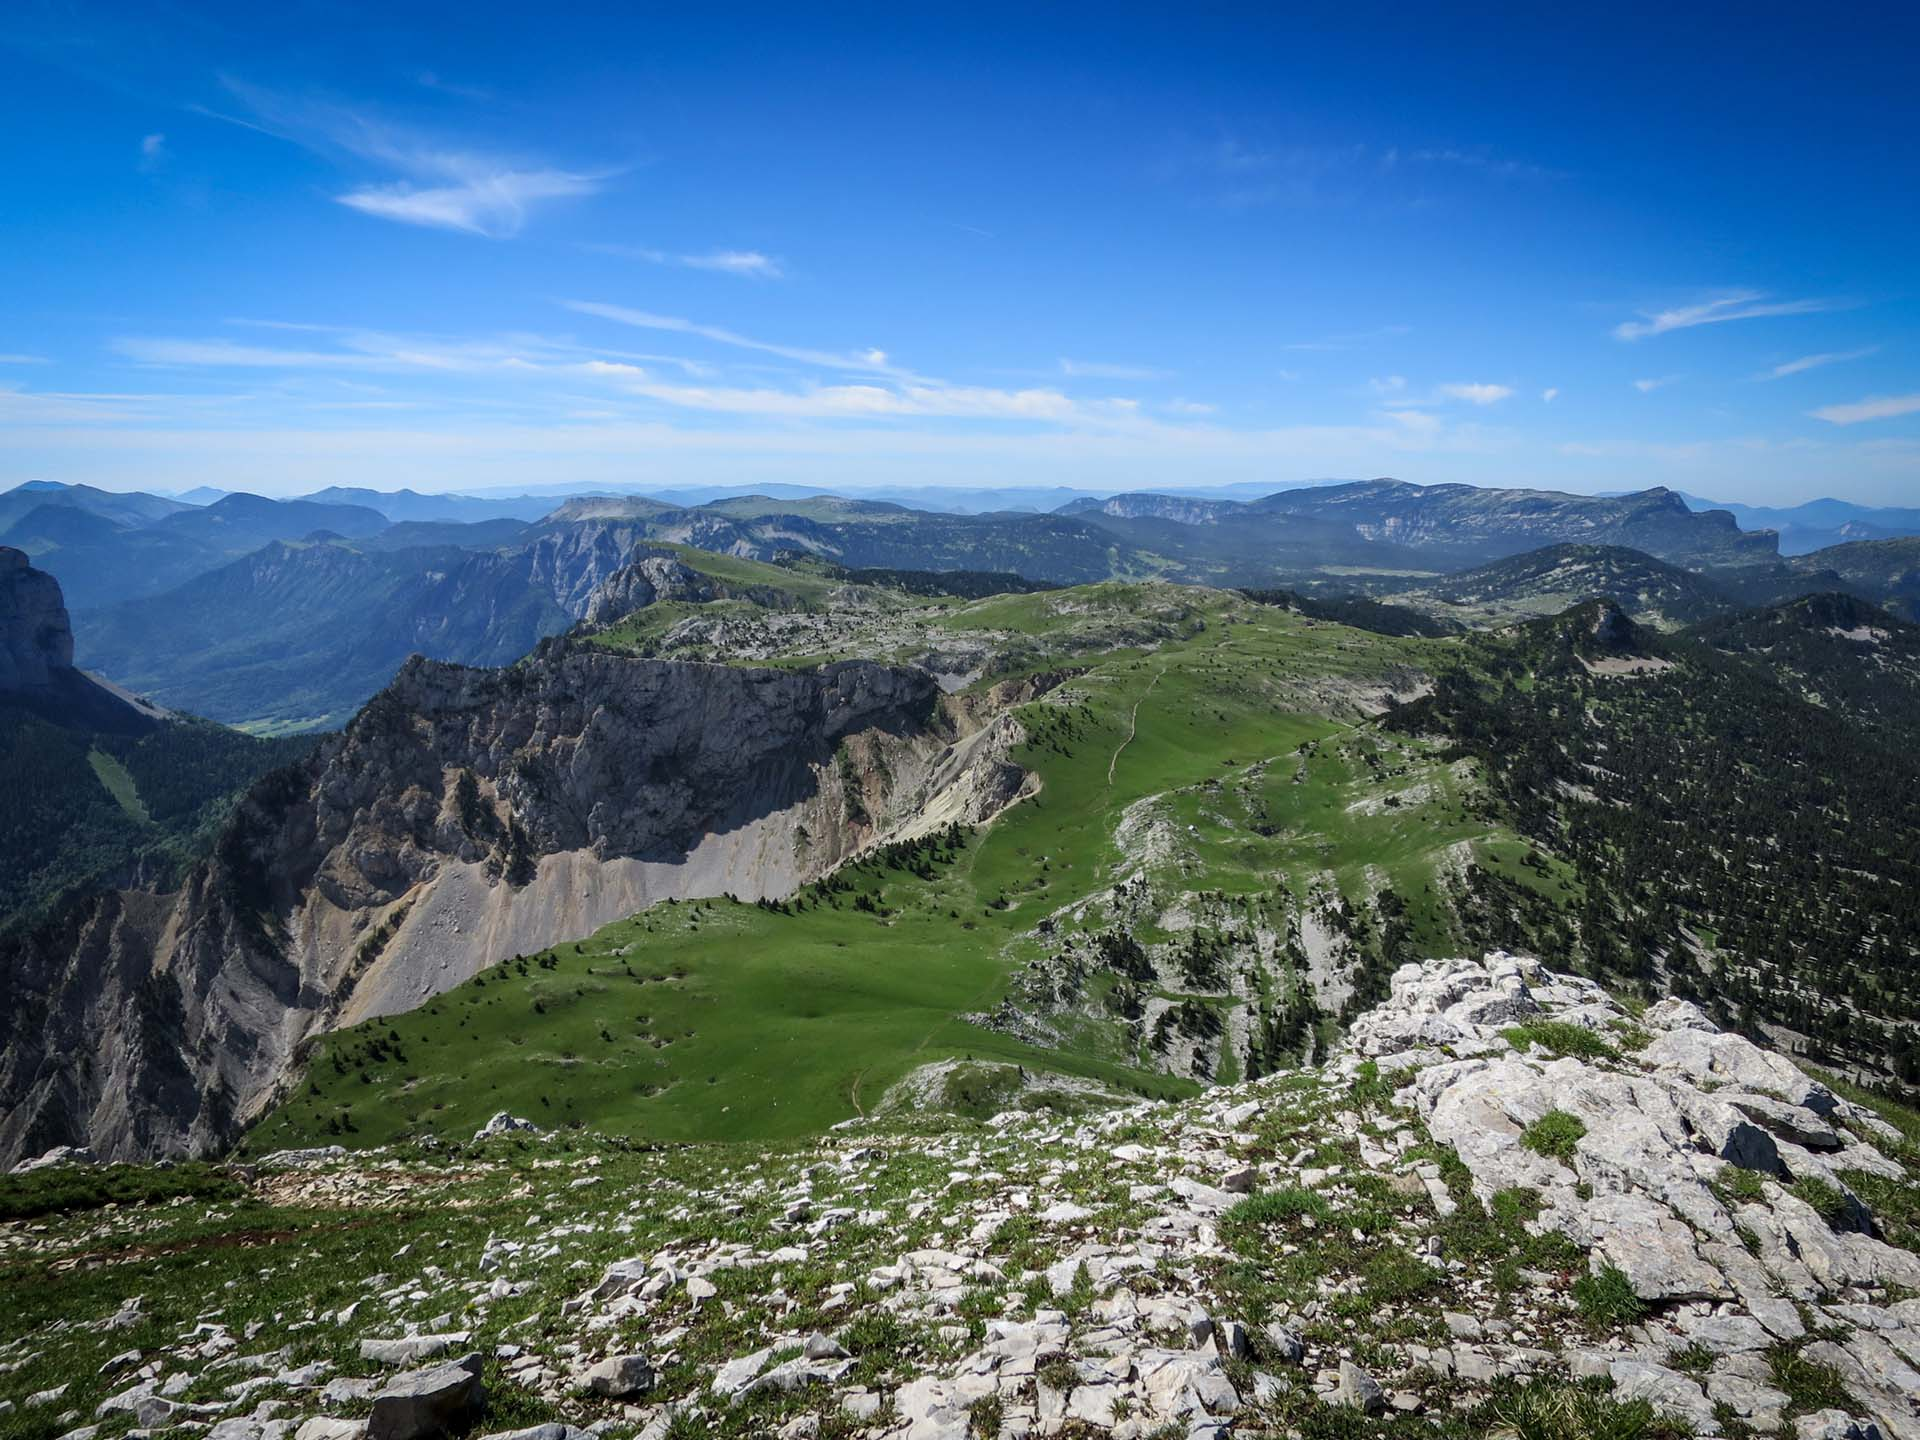 Panorama Grand Veymont Hauts Plateaux Vercors Itinerance Sejour Trek Tente Slow Rando